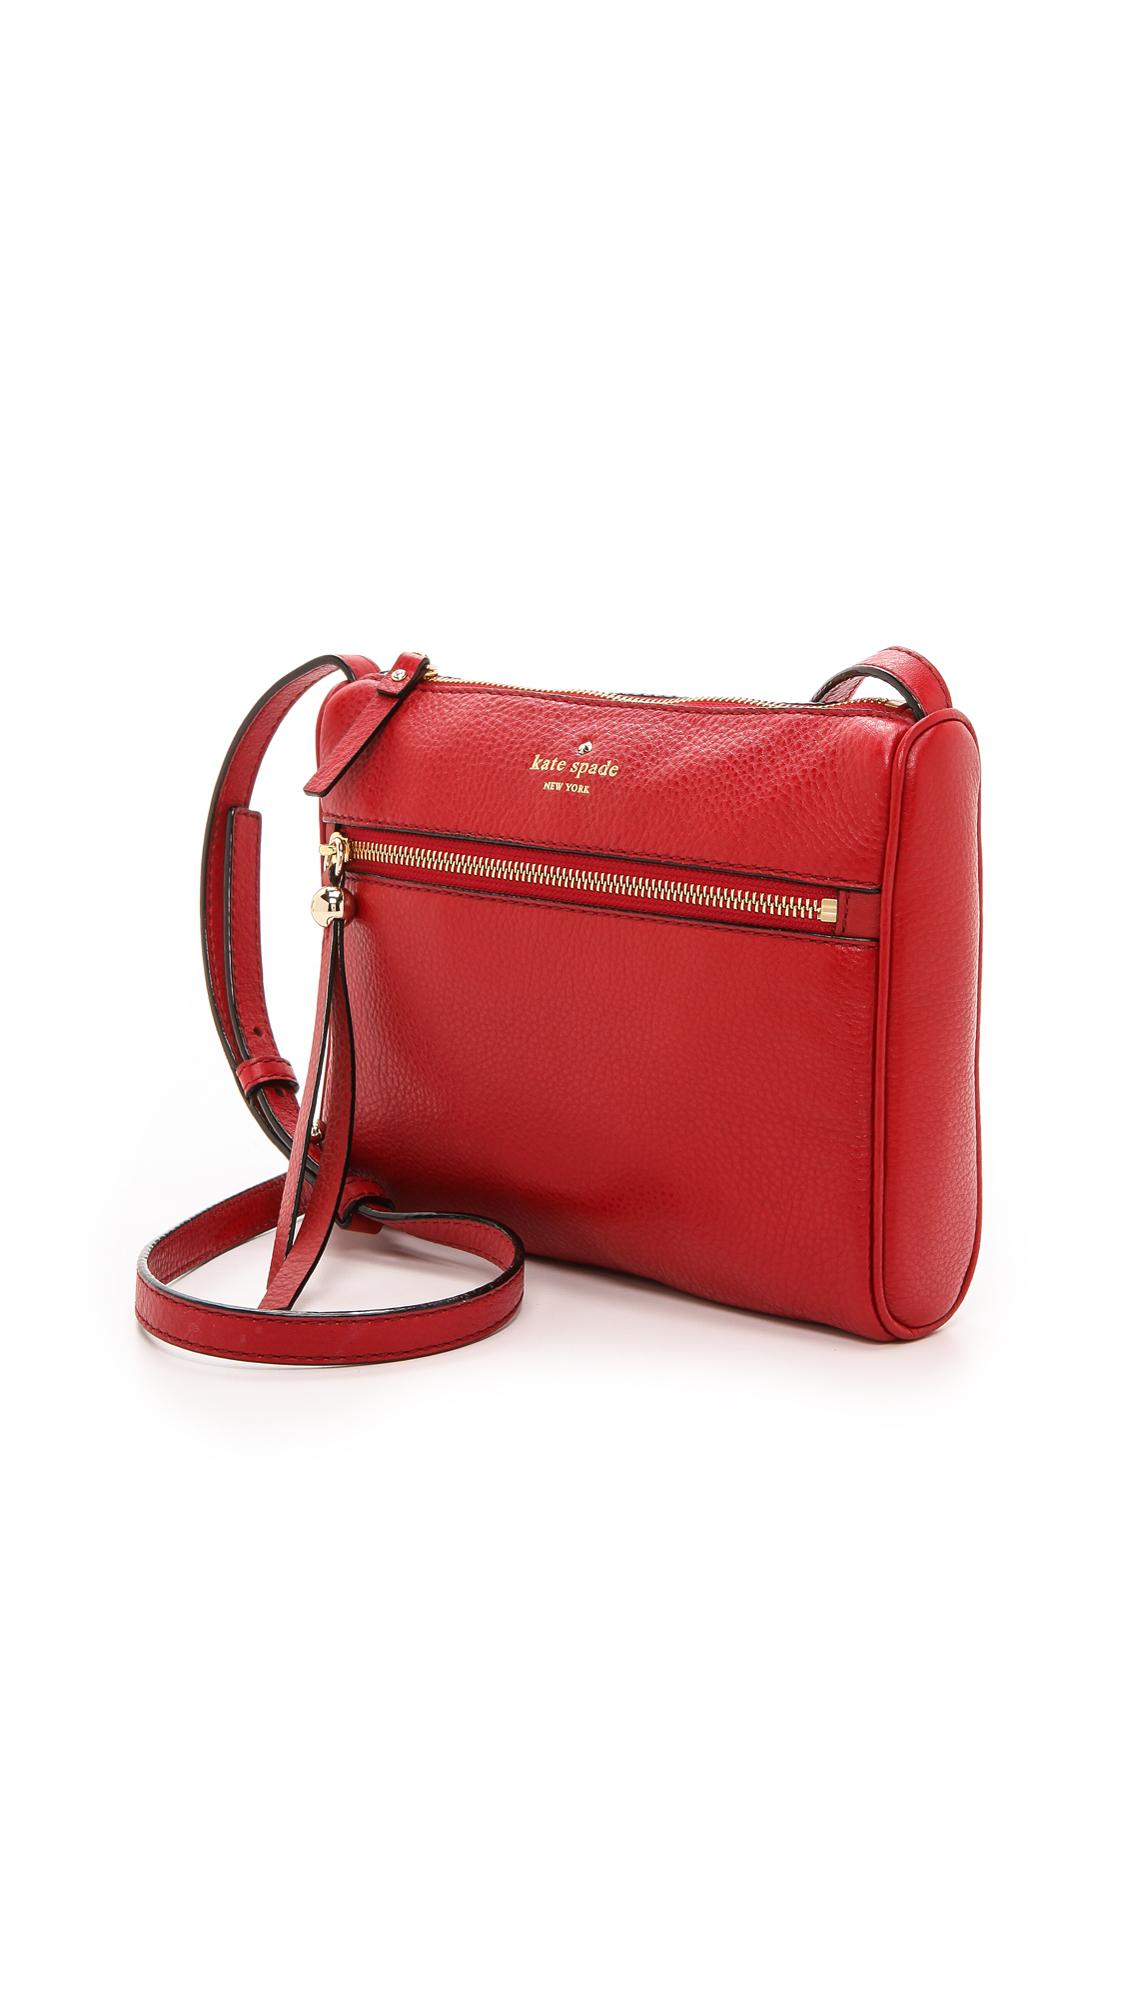 Lyst Kate Spade New York Cayli Cross Body Bag Black In Red